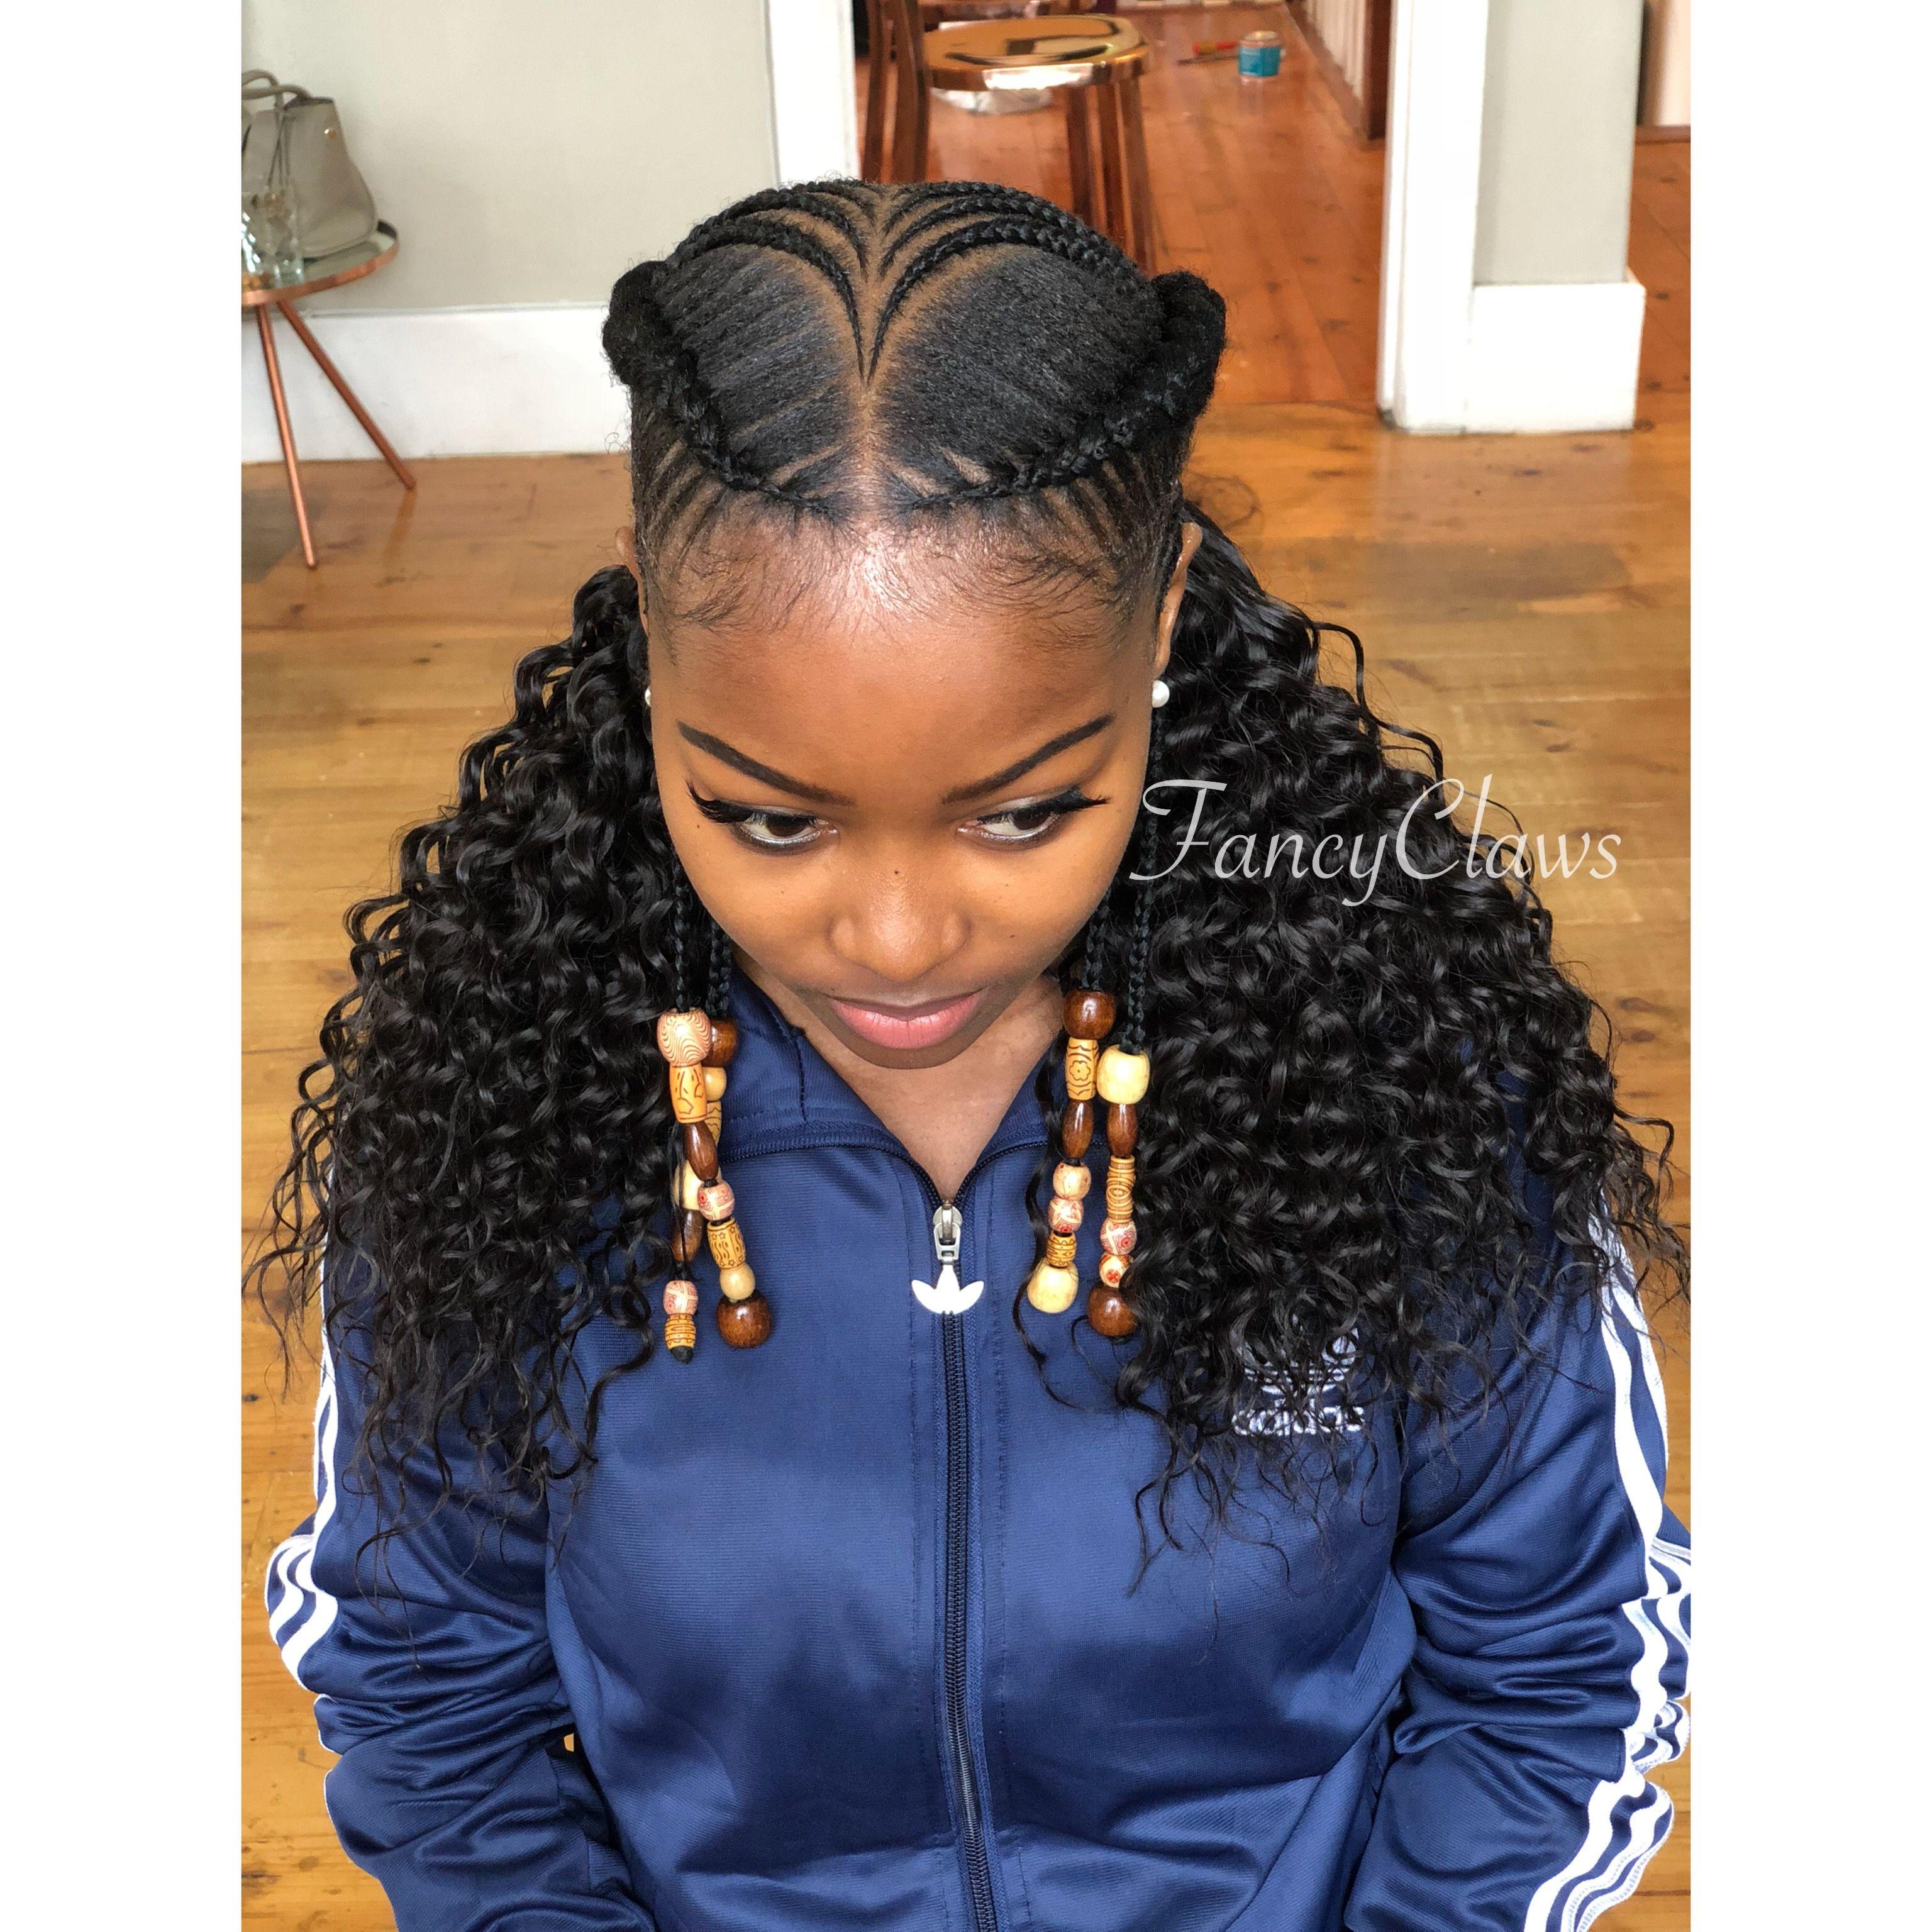 15 Hurst Grove Musgrave Durban South Africa 0712093250 Hair Styles Natural Hair Styles Braided Hairstyles